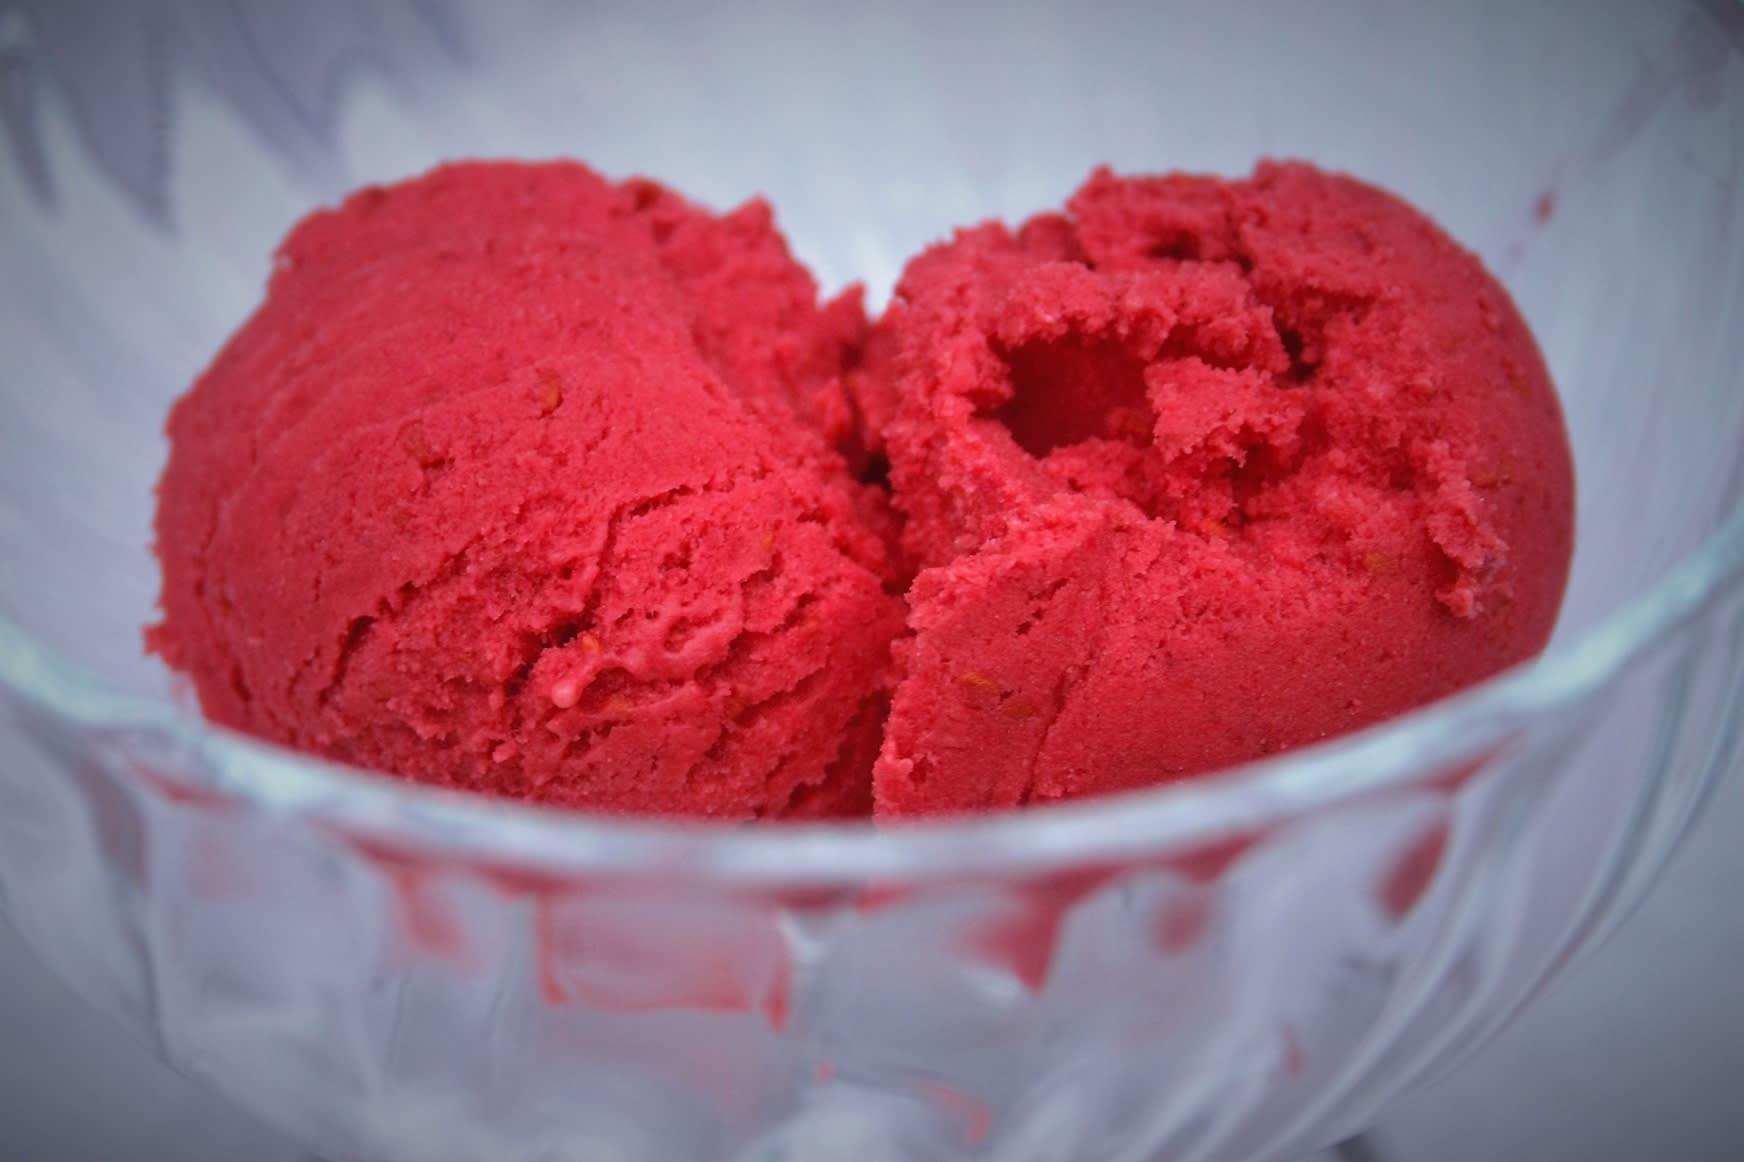 A delicious sugar-free dessert recipe for diabetics.